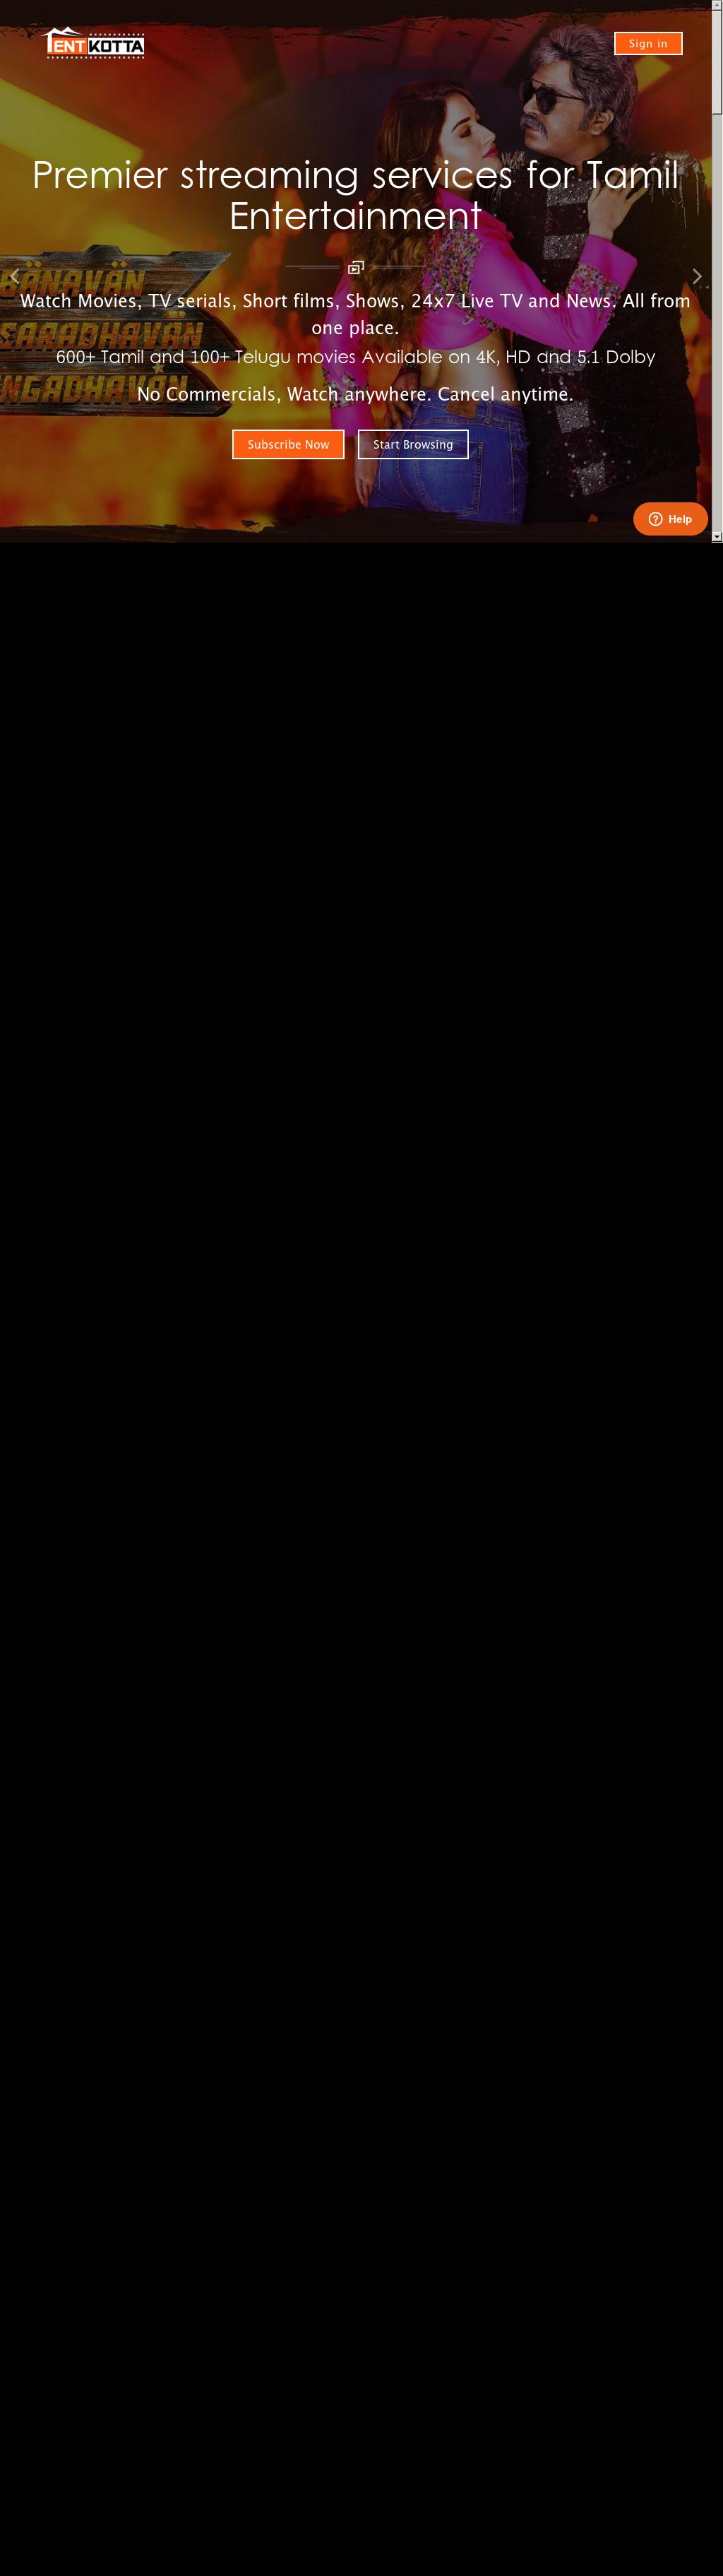 Tentkotta Competitors, Revenue and Employees - Owler Company Profile